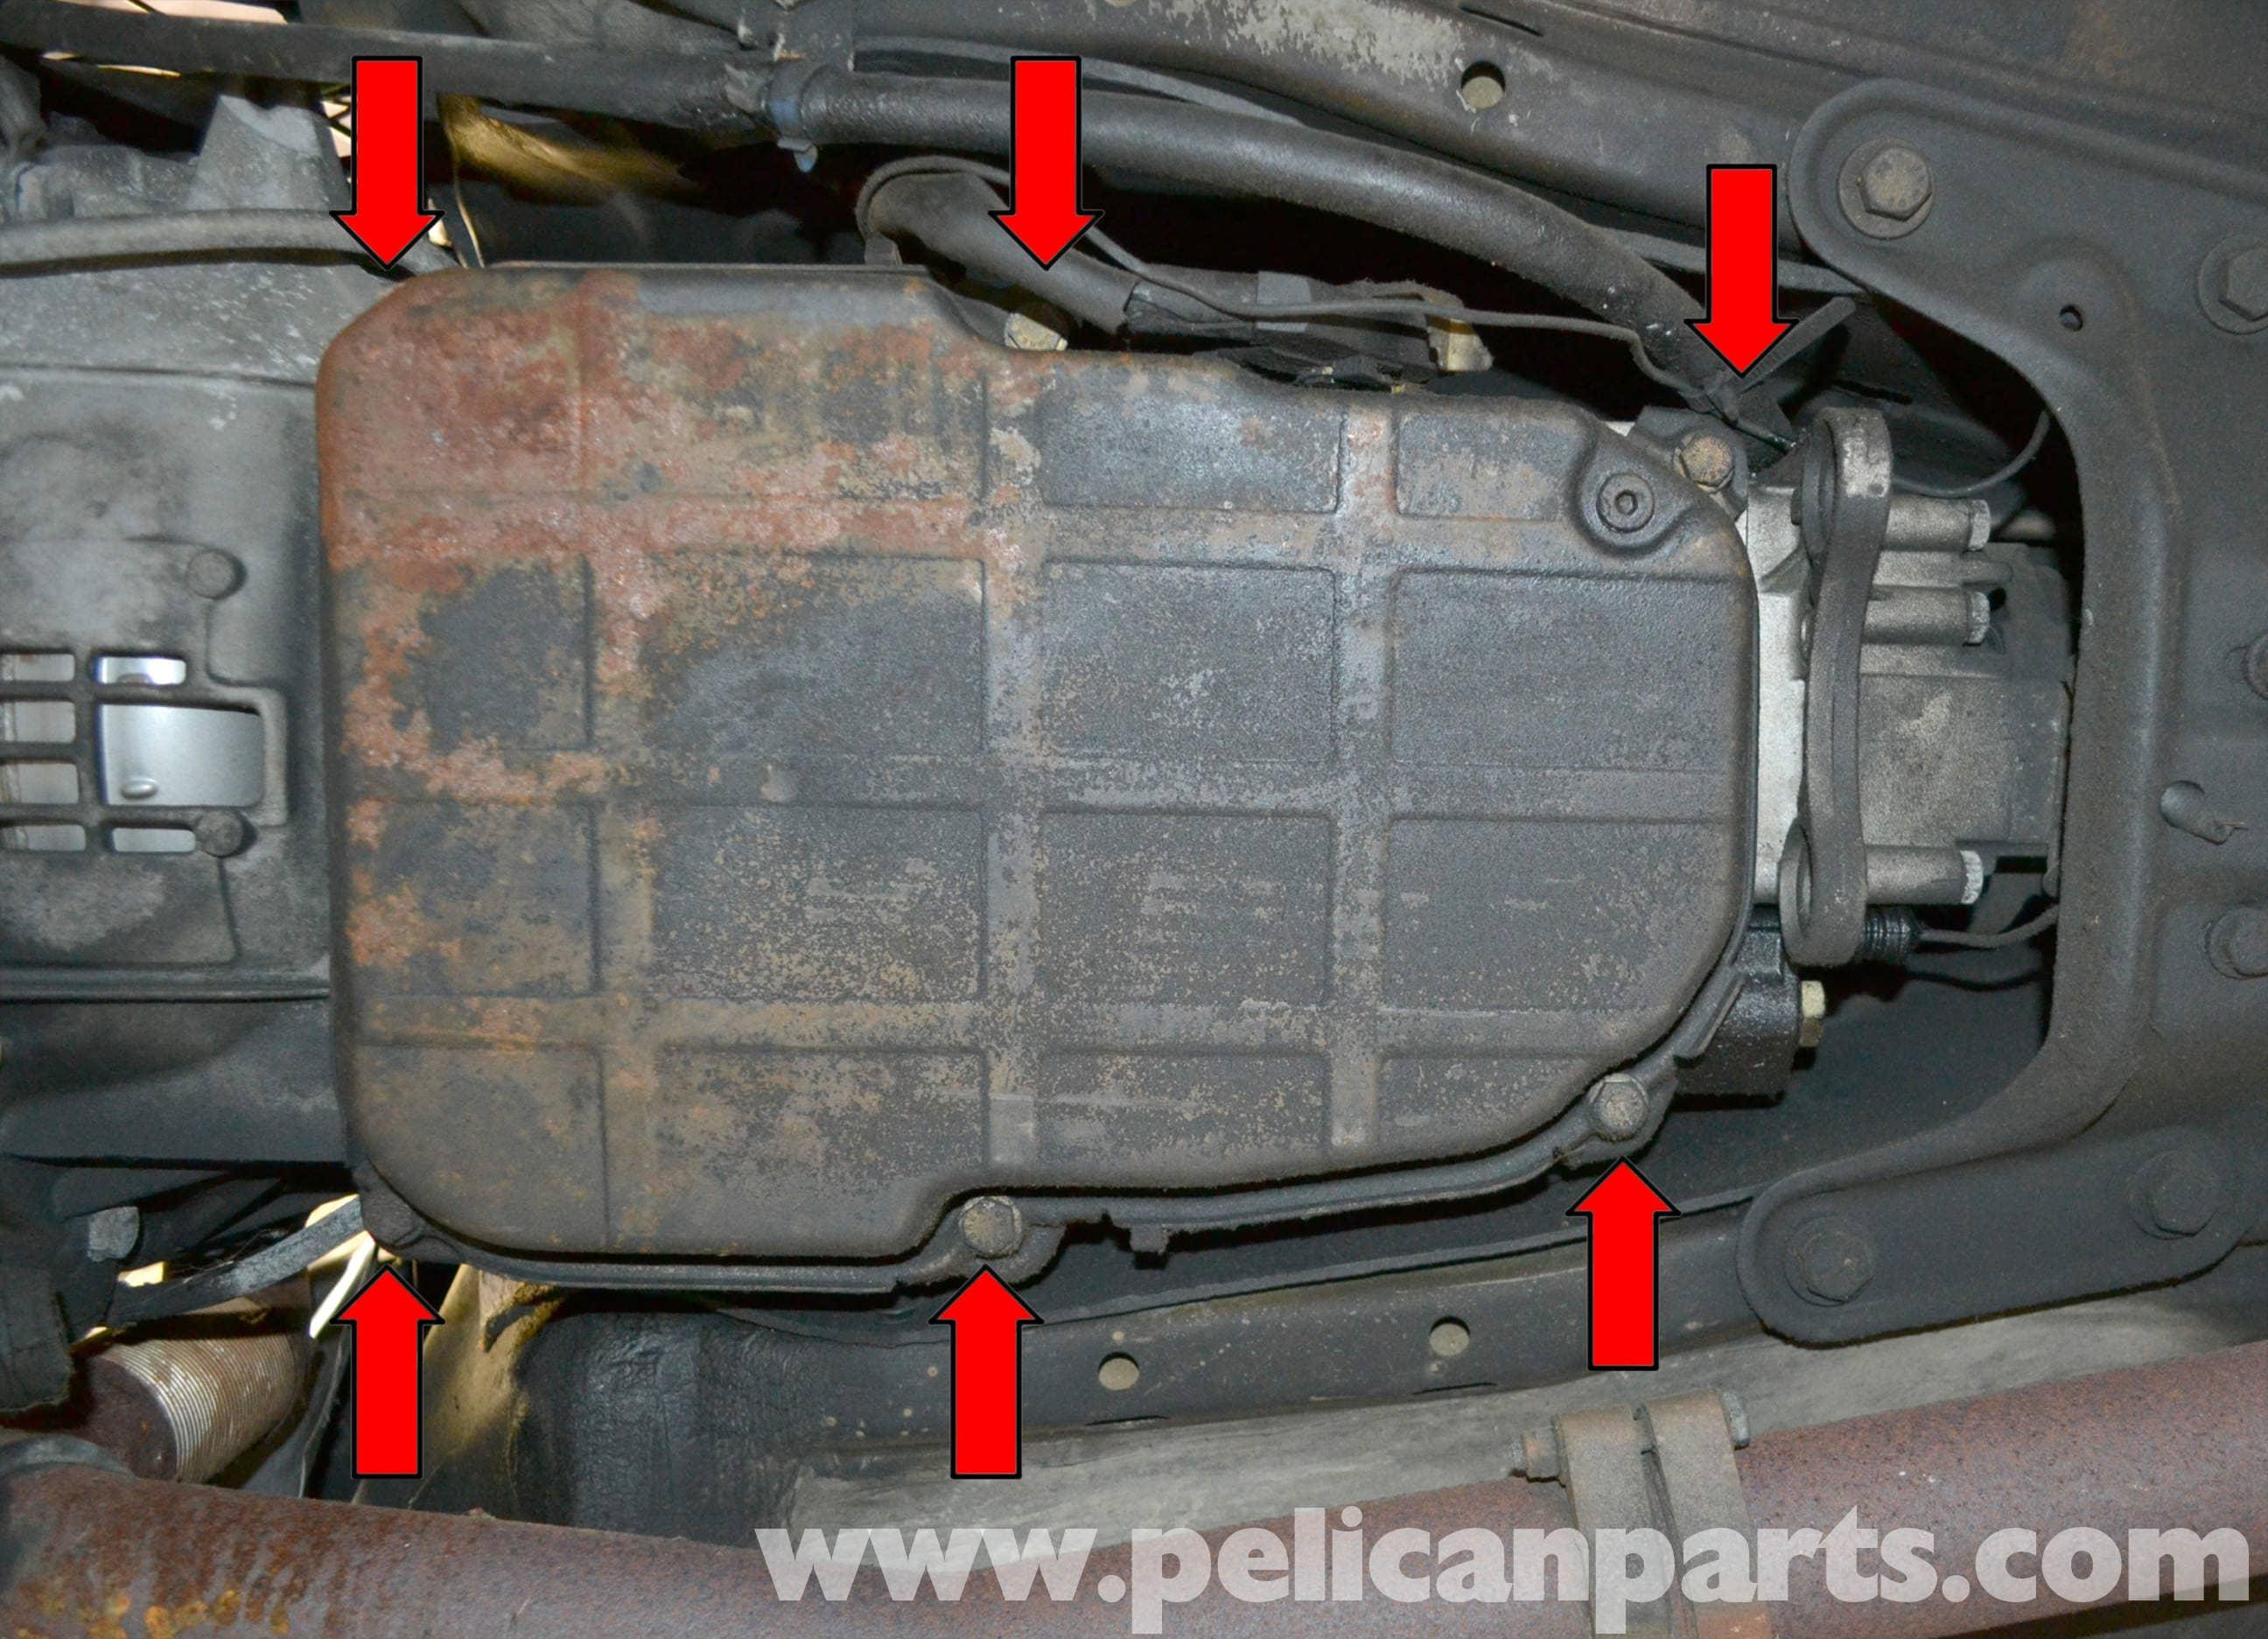 2001 honda civic manual transmission fluid